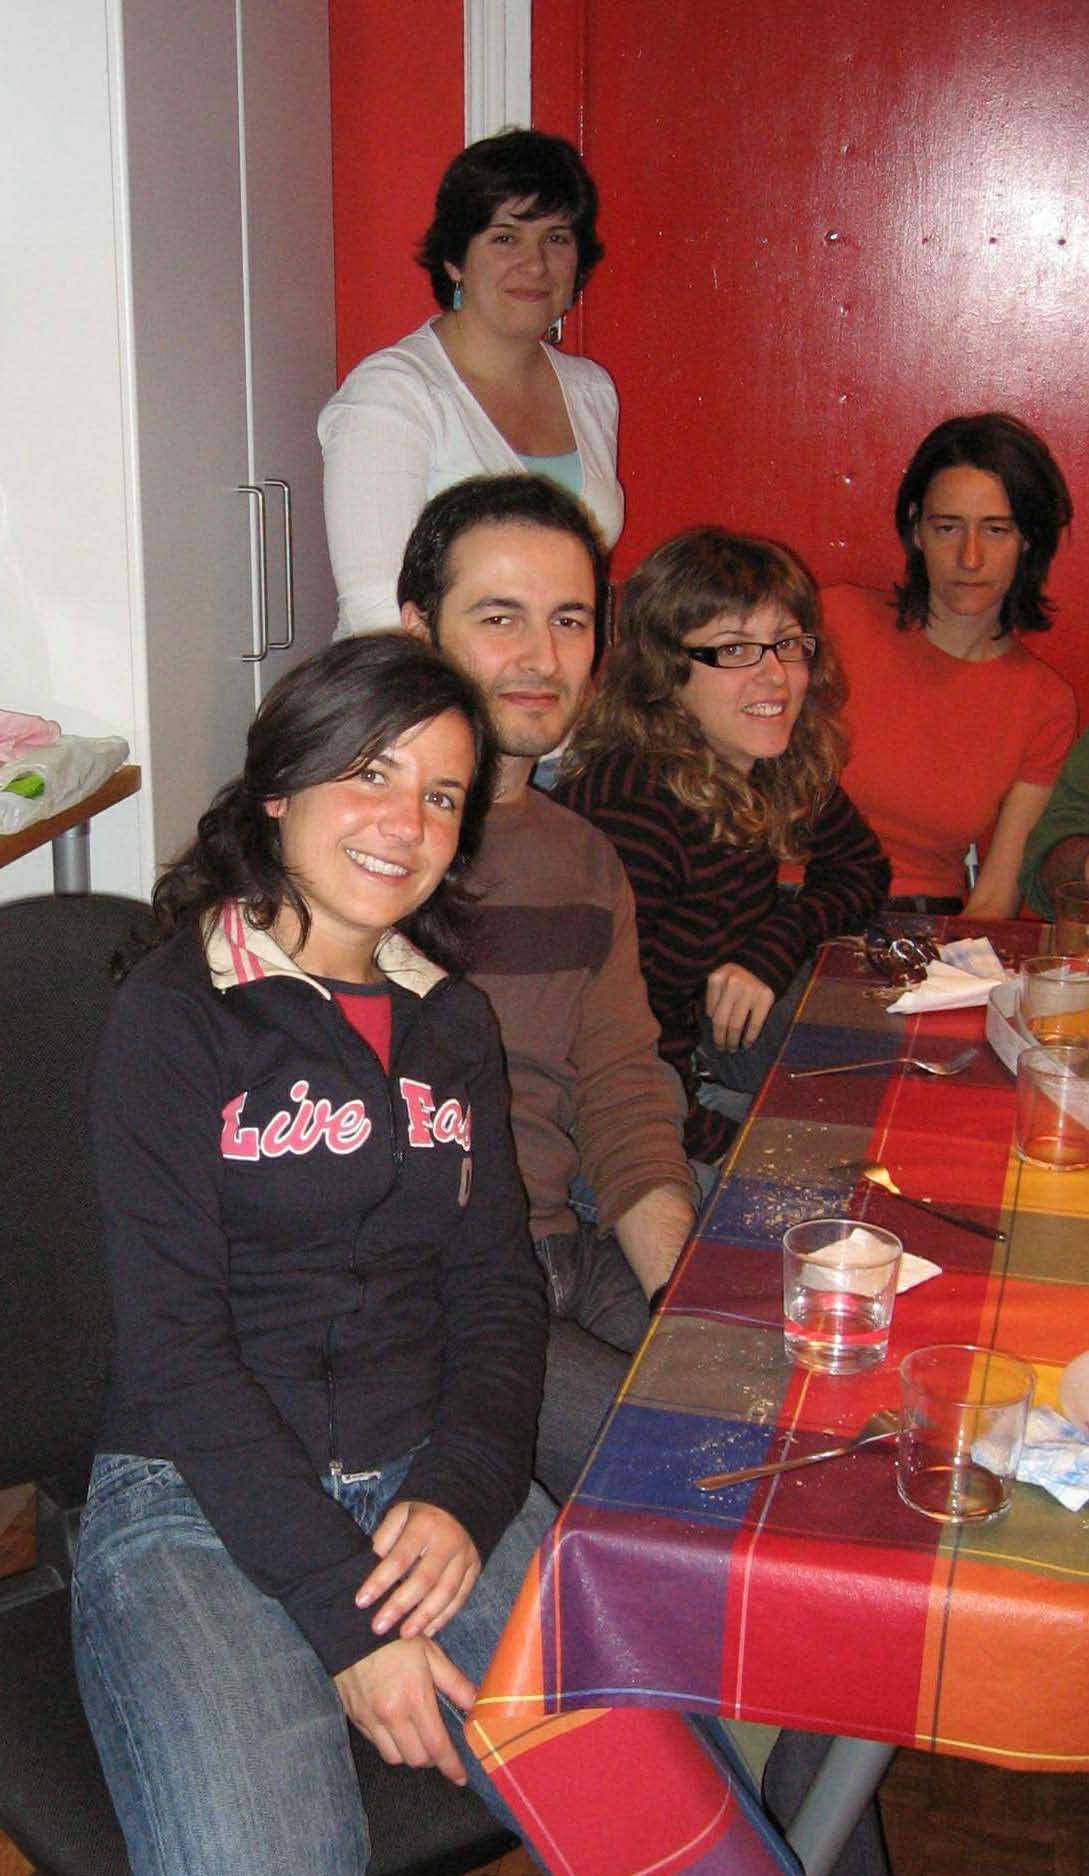 Mª Carmen Delgado, Iván Barreira, Lola Vivas, Laura Galisteo y Esther Redondo